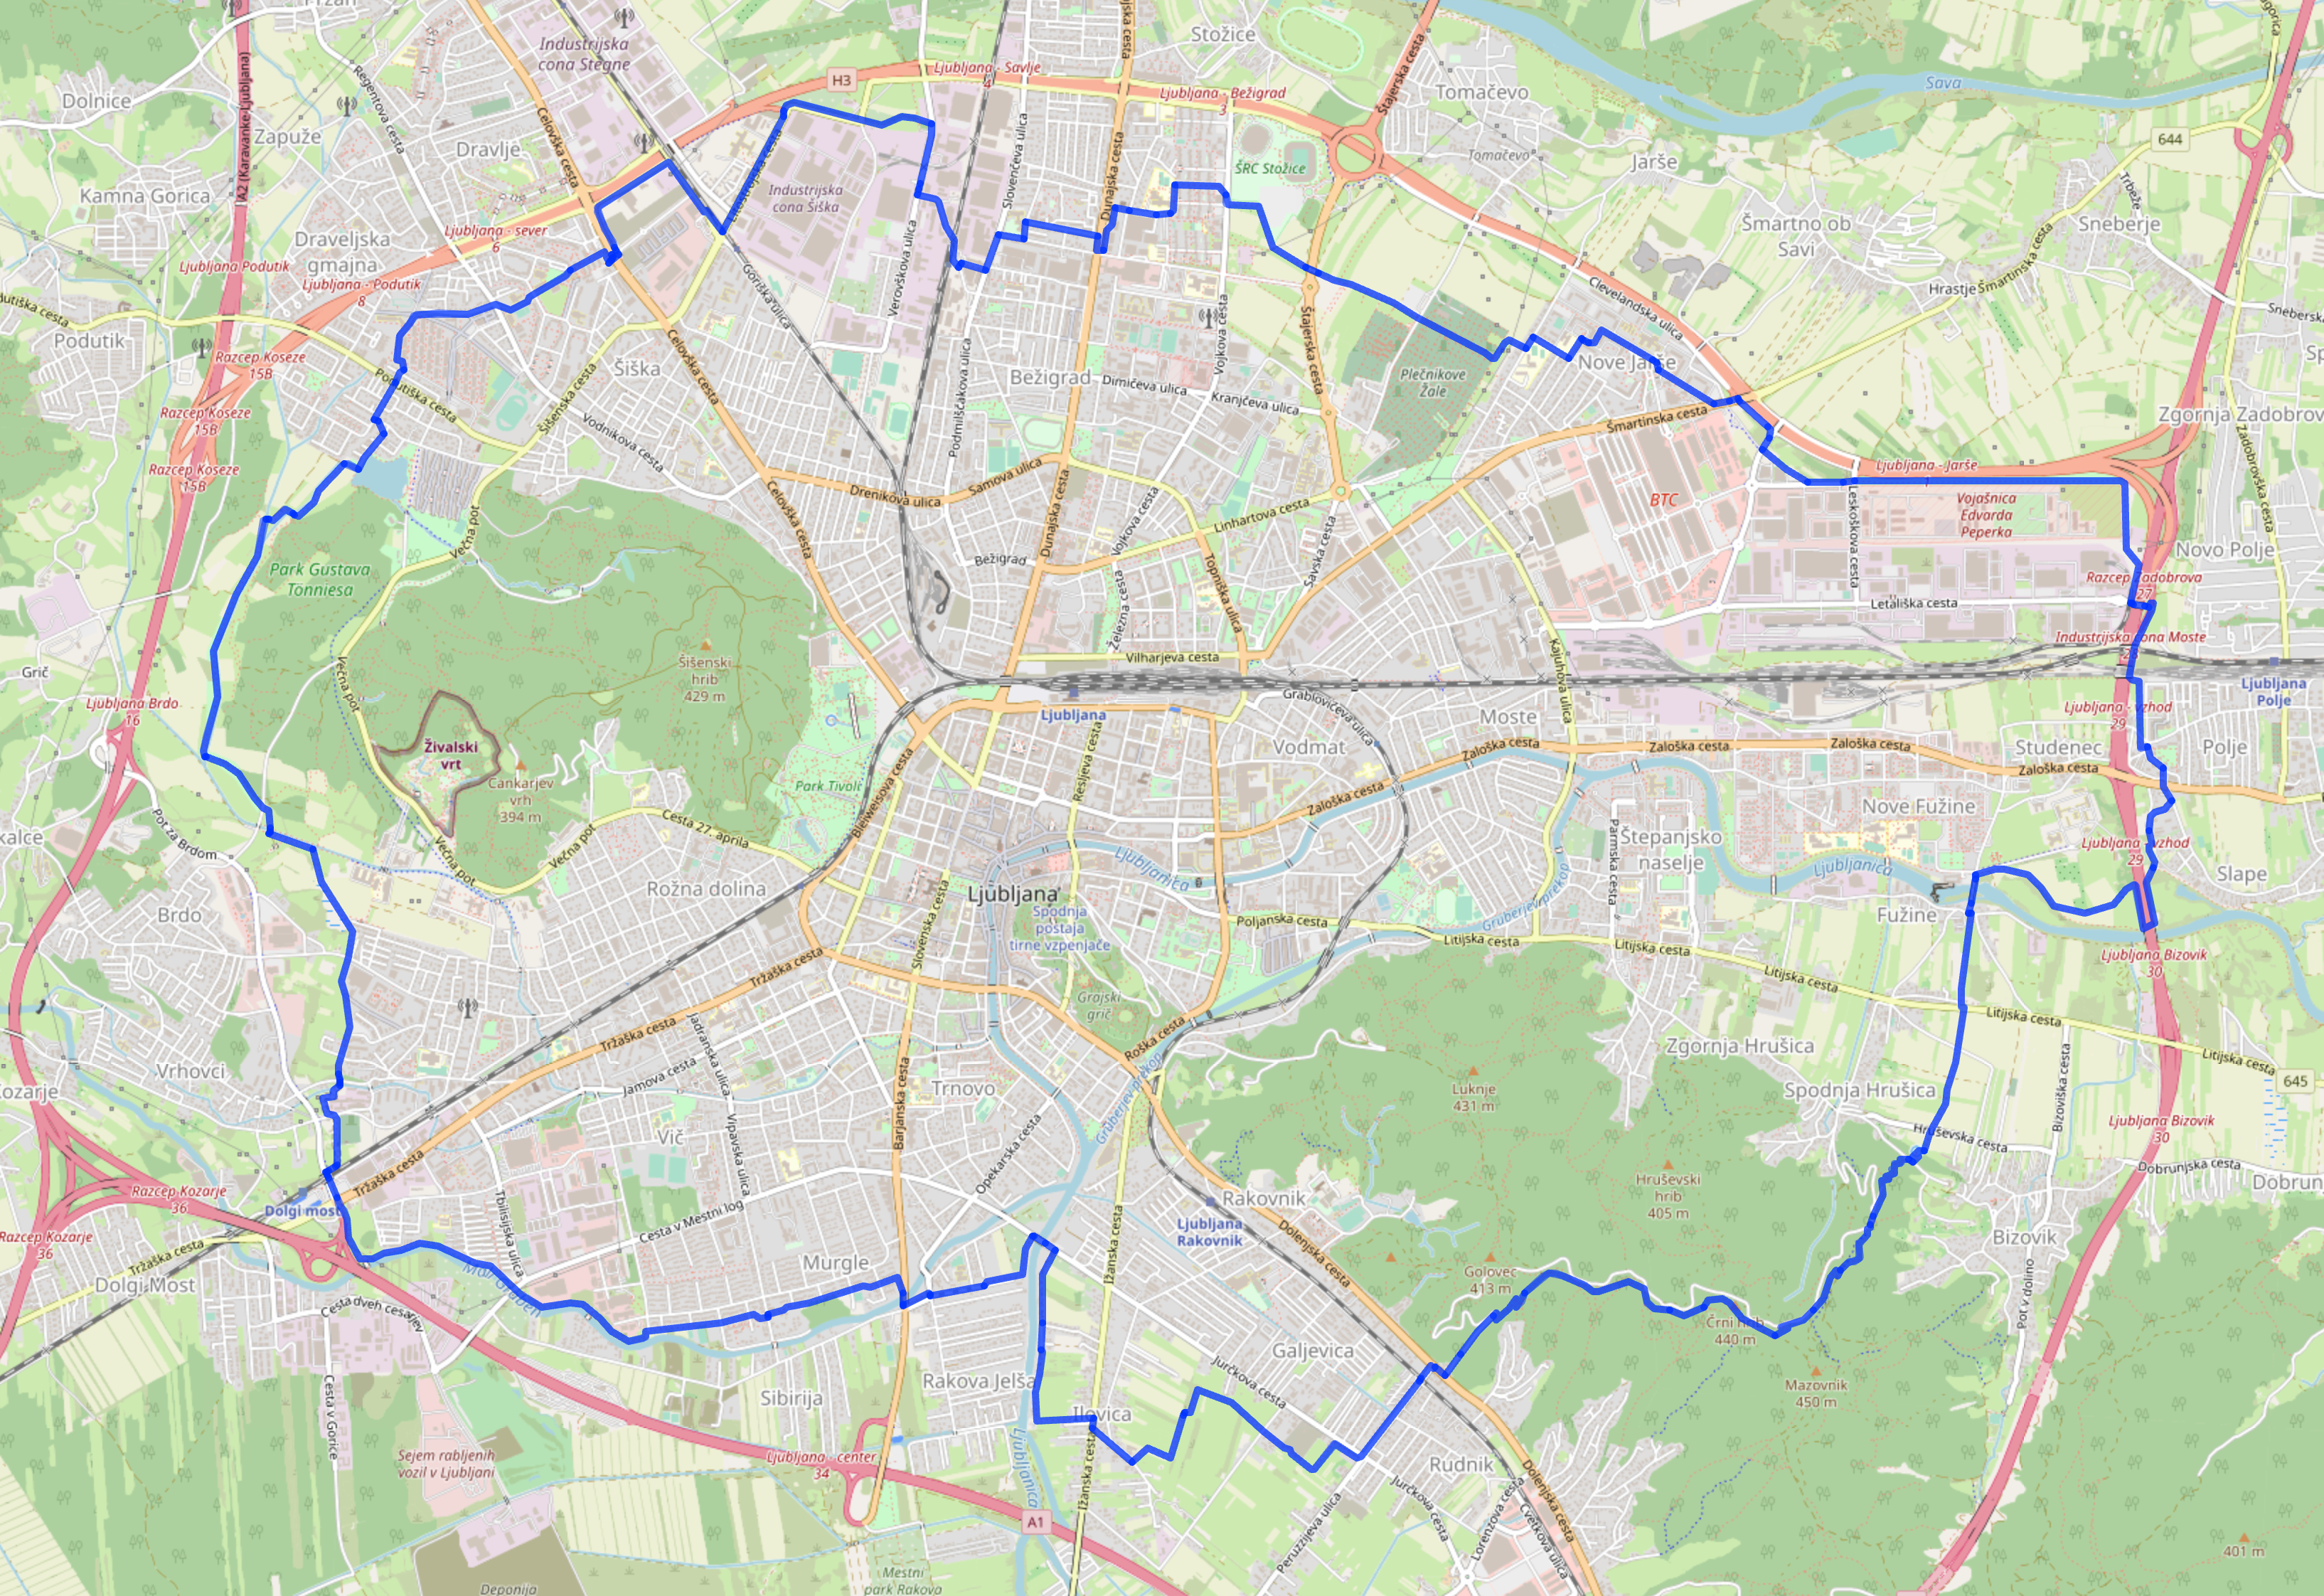 btc liubliana zemljevid)